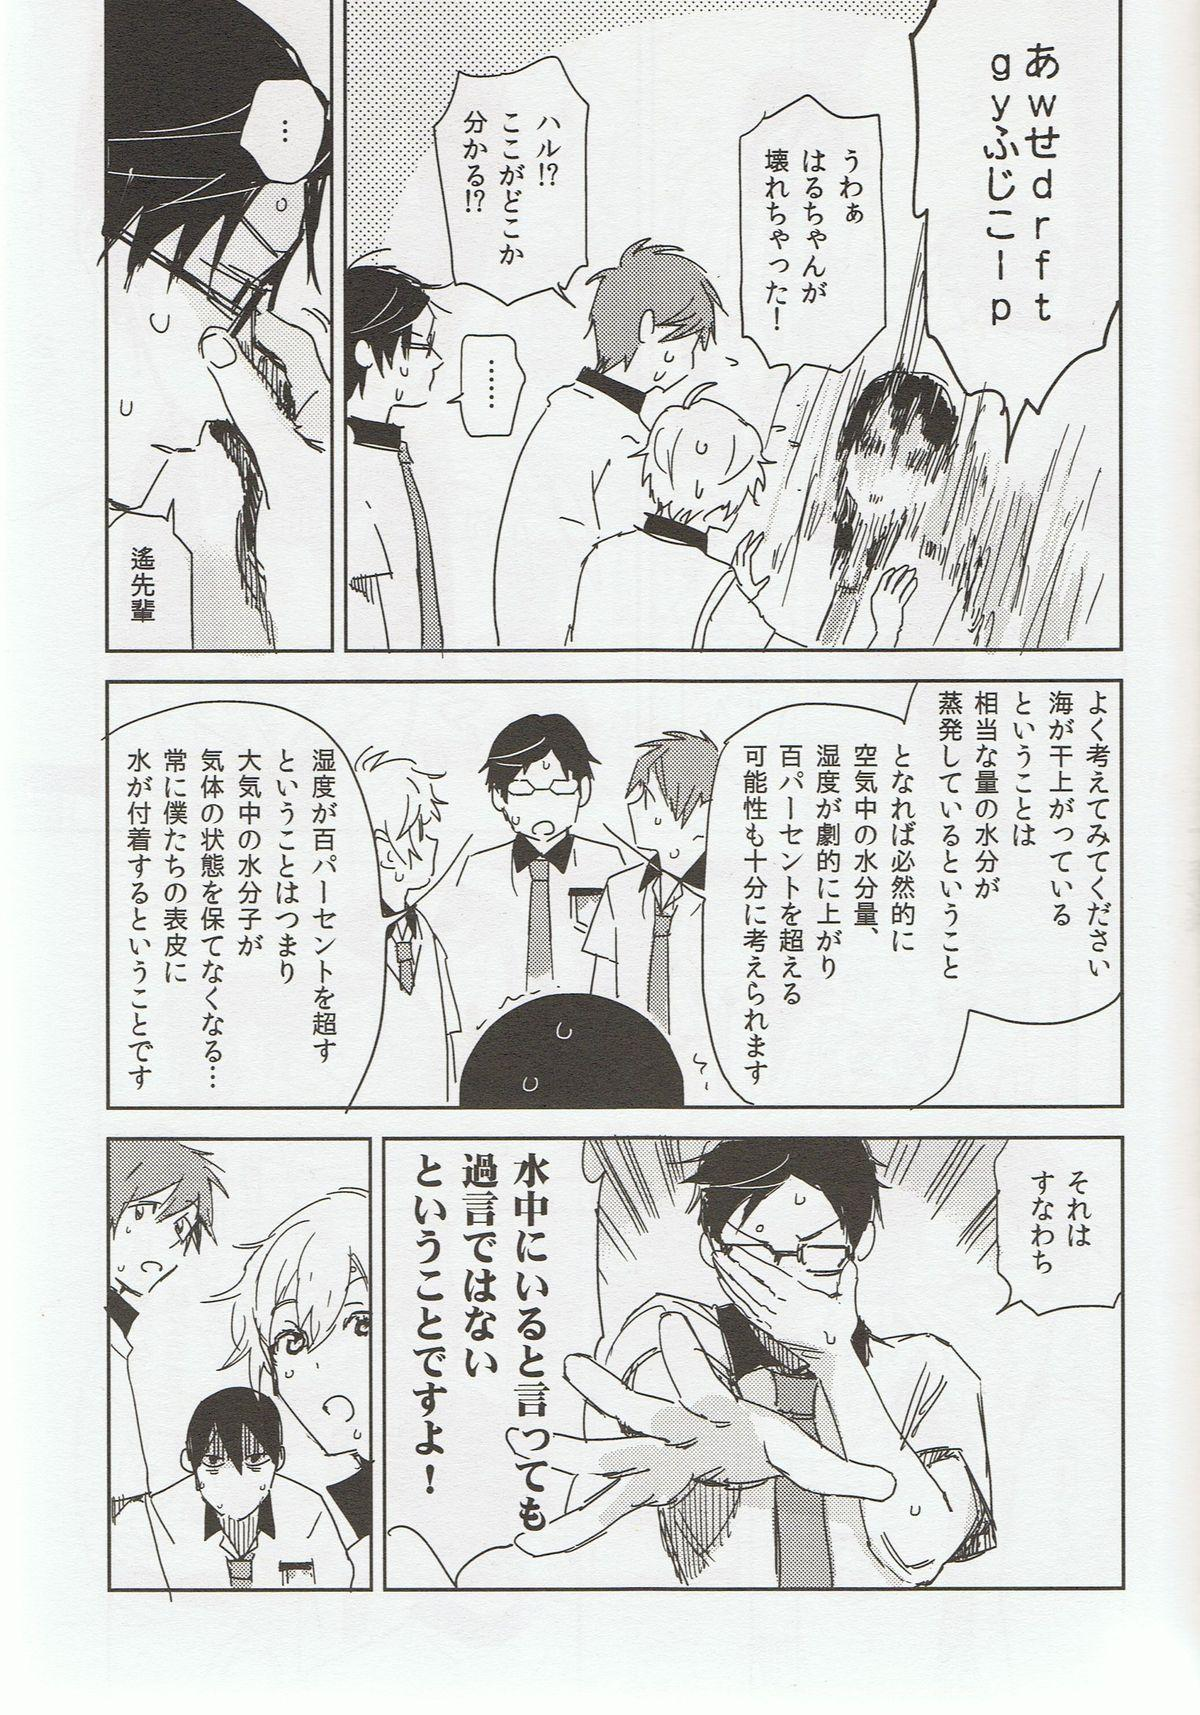 Sou da, Tottori Sakyuu Ikou. 7